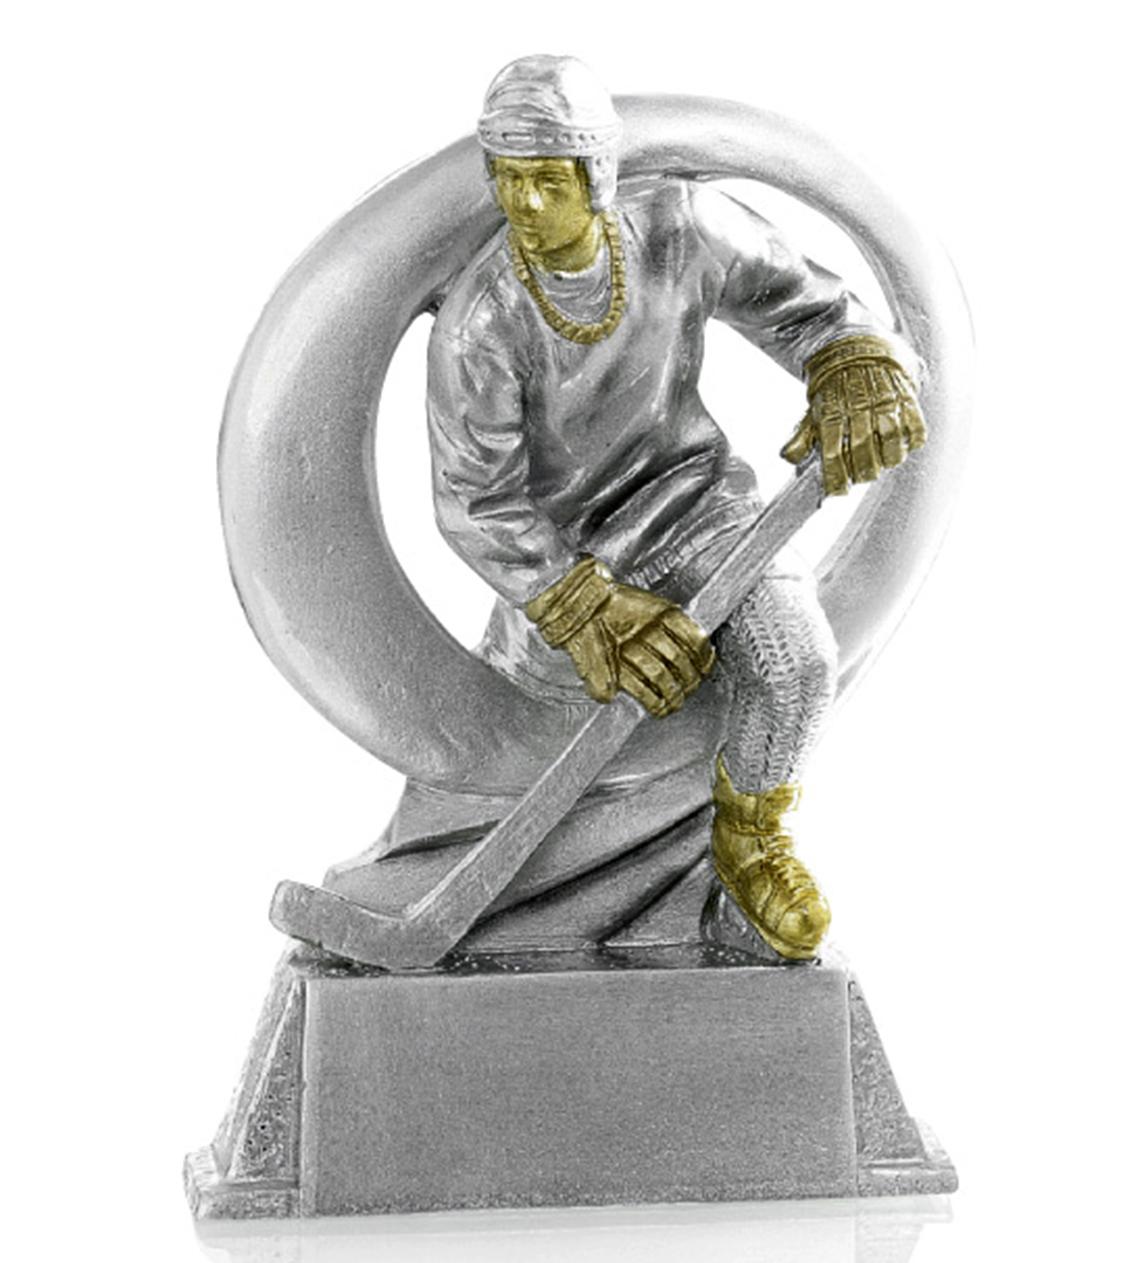 Pokale Eishockey Figur: 9-106-71415 in 17 cm